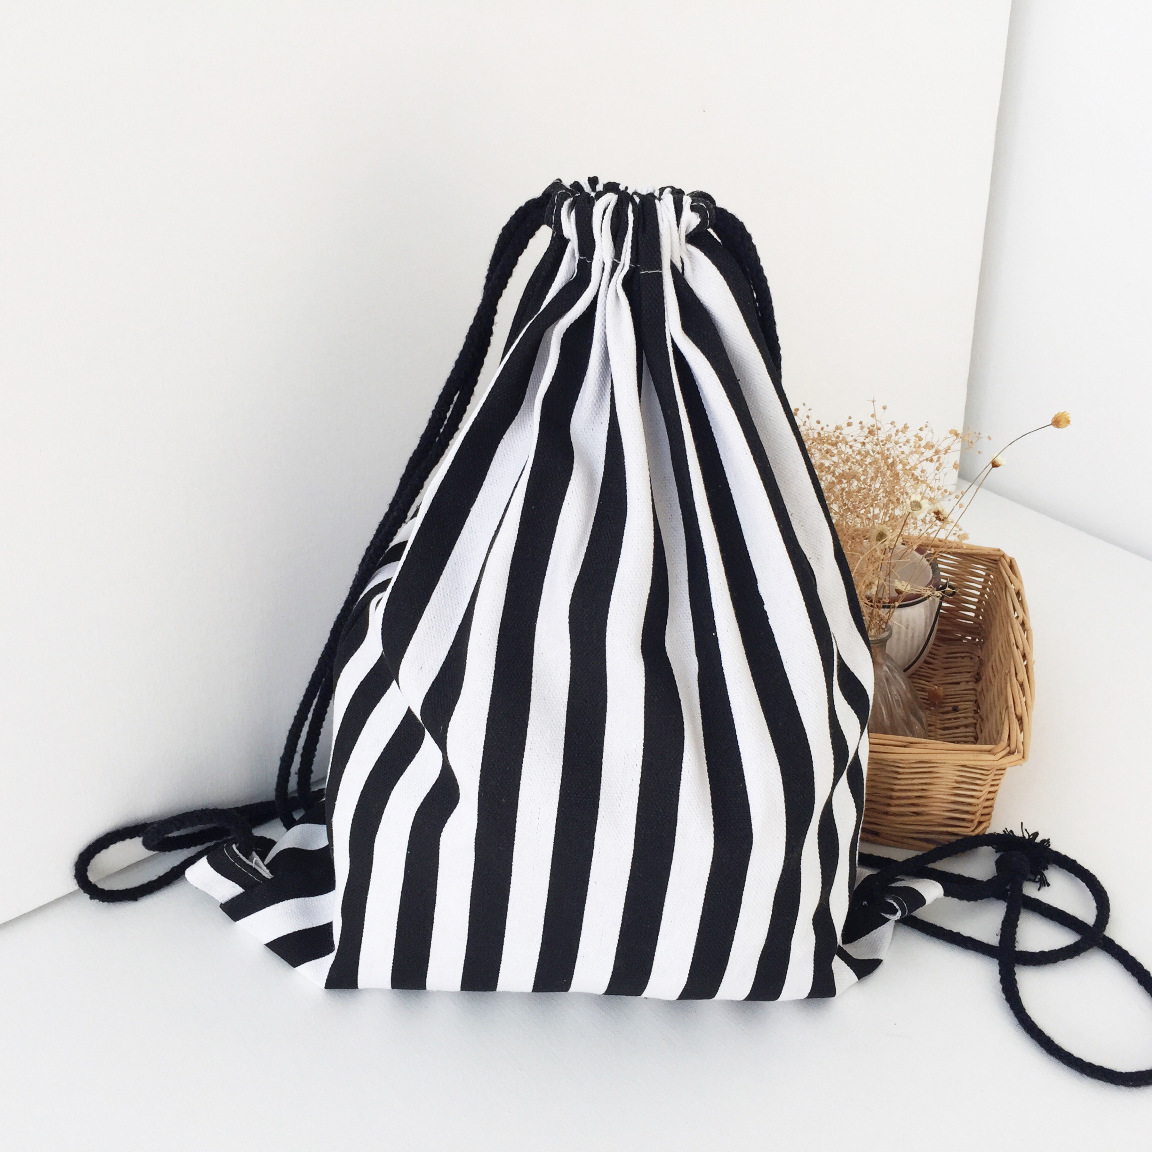 Fashion Drawstring Bag Backpack Stripe Printing Teenagers Backpacks Unisex Travel Storage Package Mini Casual Shopping Bags